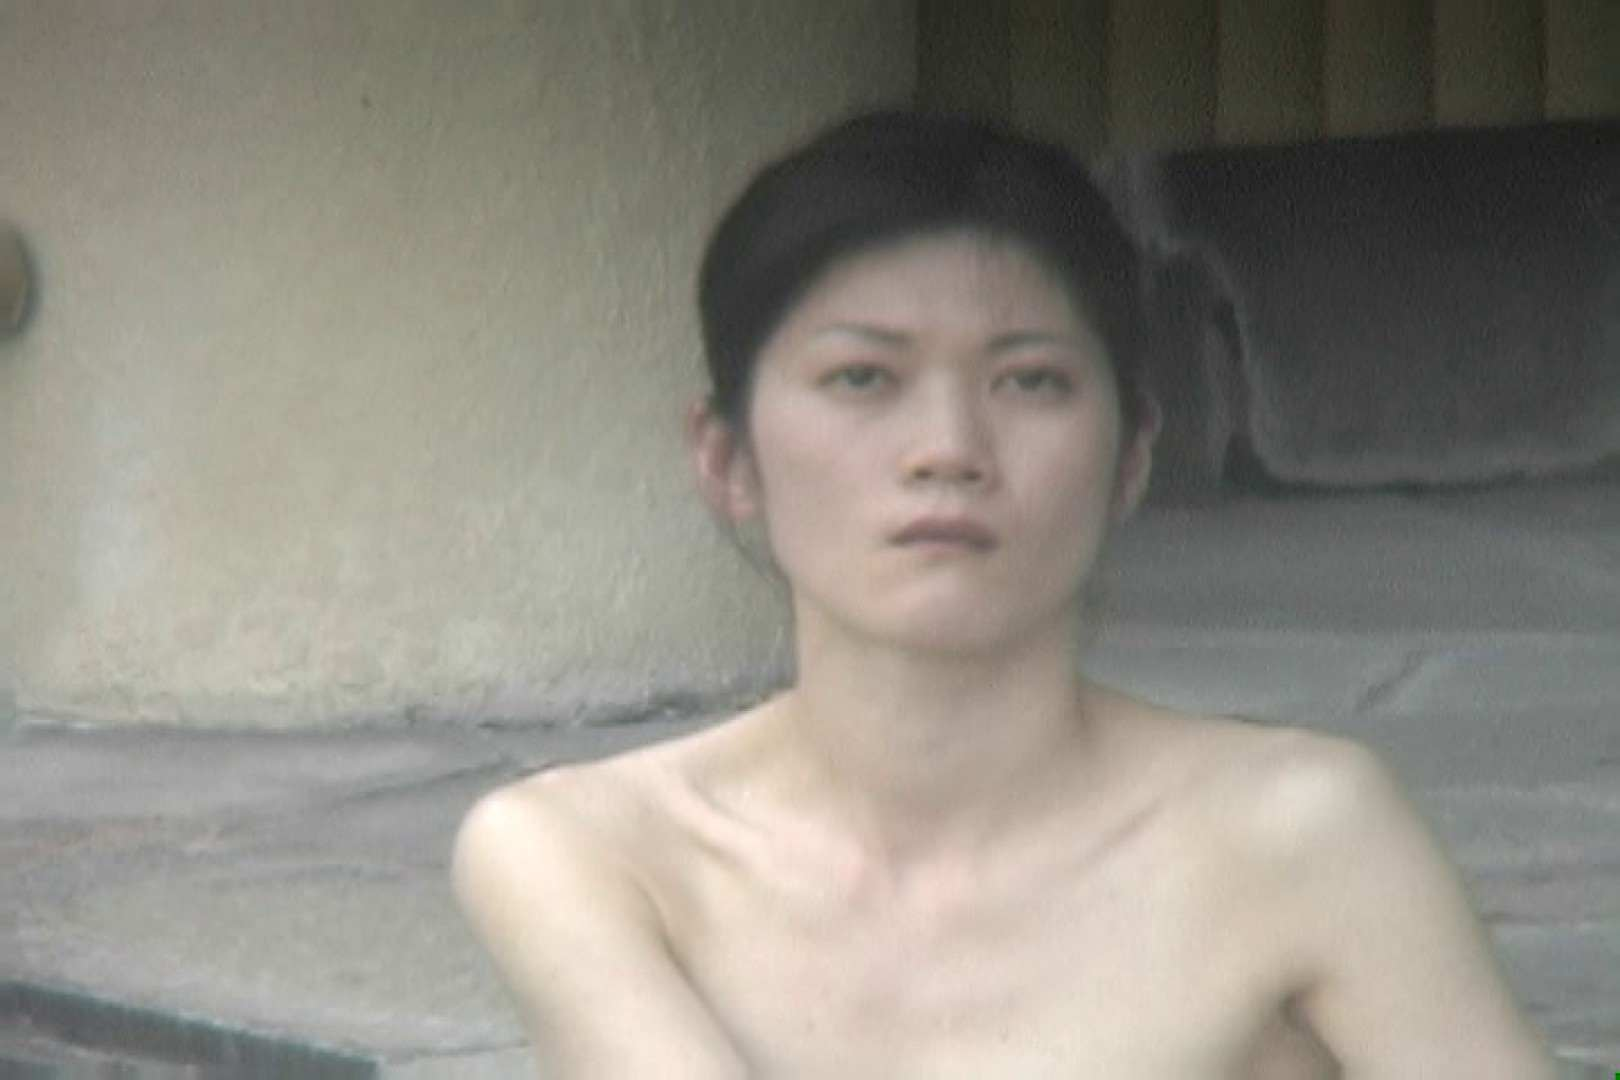 Aquaな露天風呂Vol.686 HなOL のぞき動画キャプチャ 83pic 82